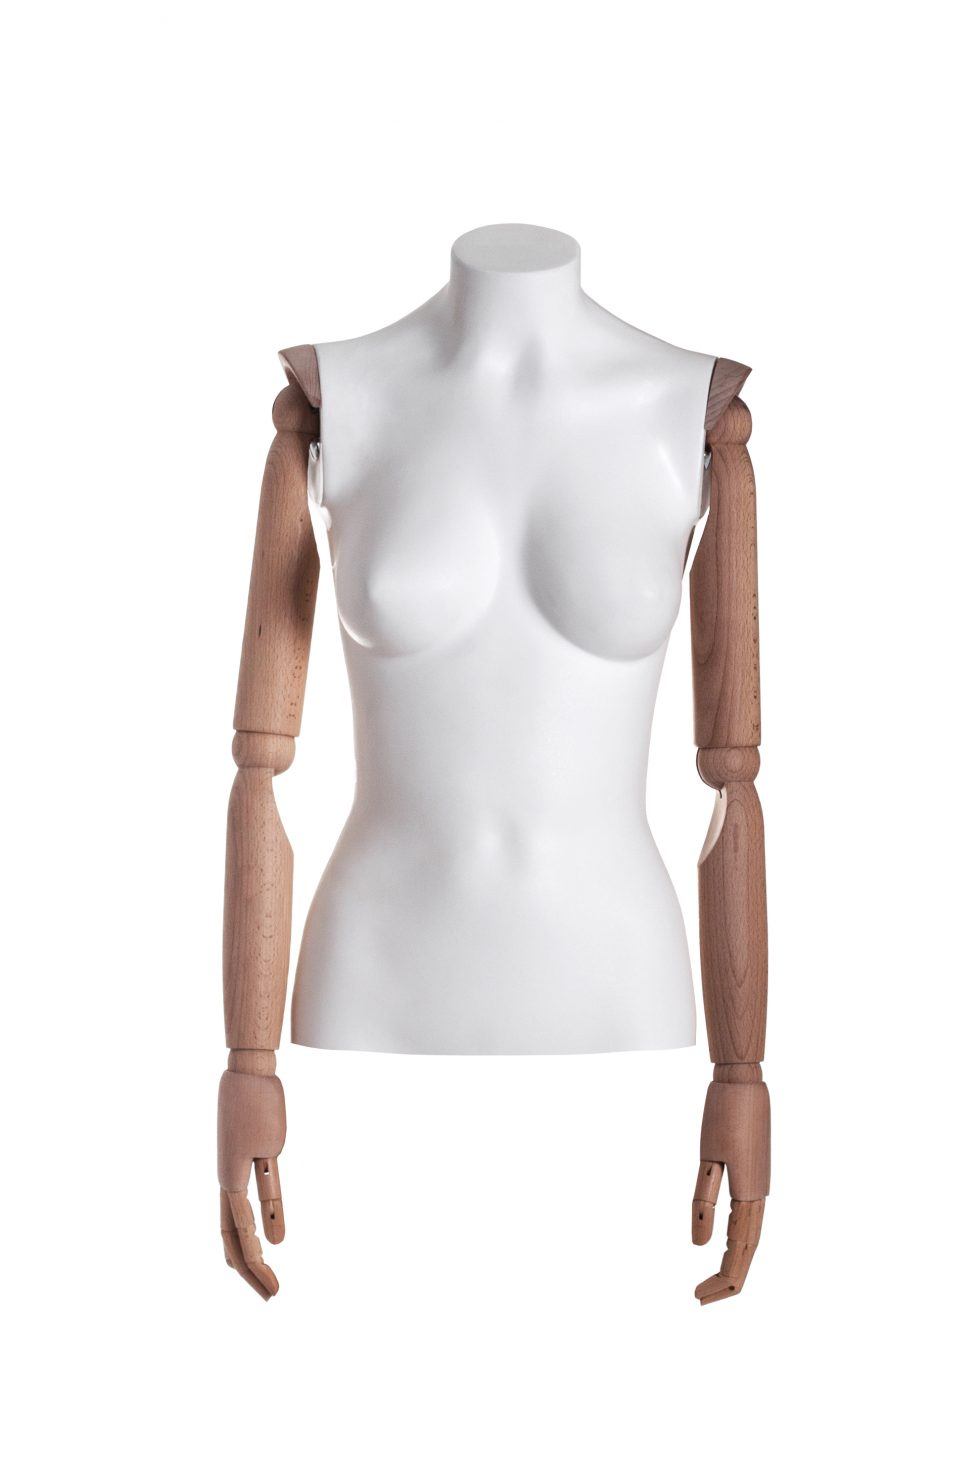 busto donna polietilene braccia in legno